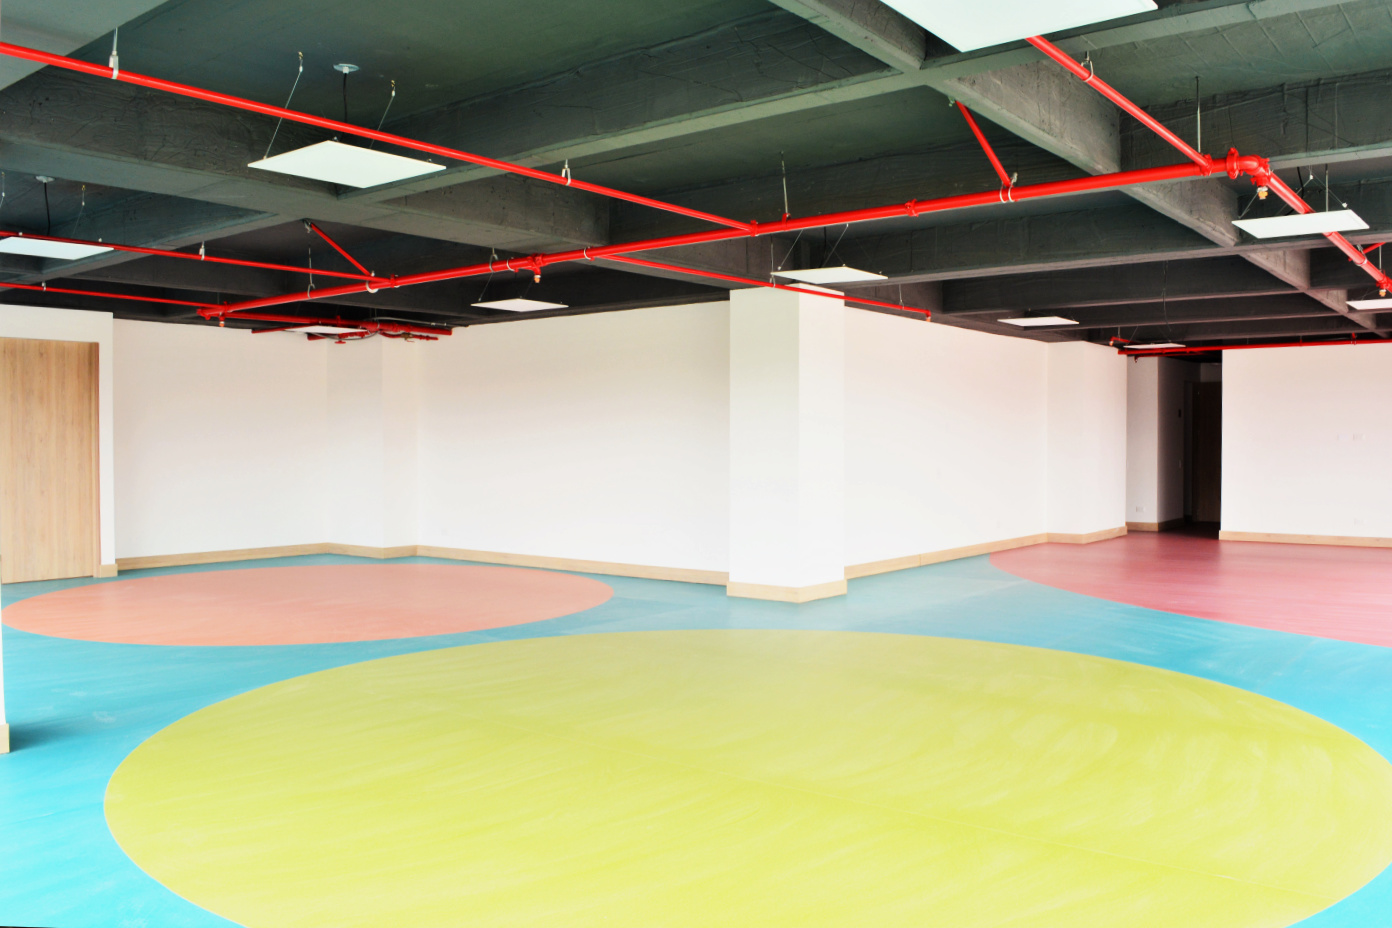 Salón de niños - Club House - Torres de Timiza, apartamentos en venta, sector Kennedy, Bogotá, vivienda de interés social VIS, aplica subsidio